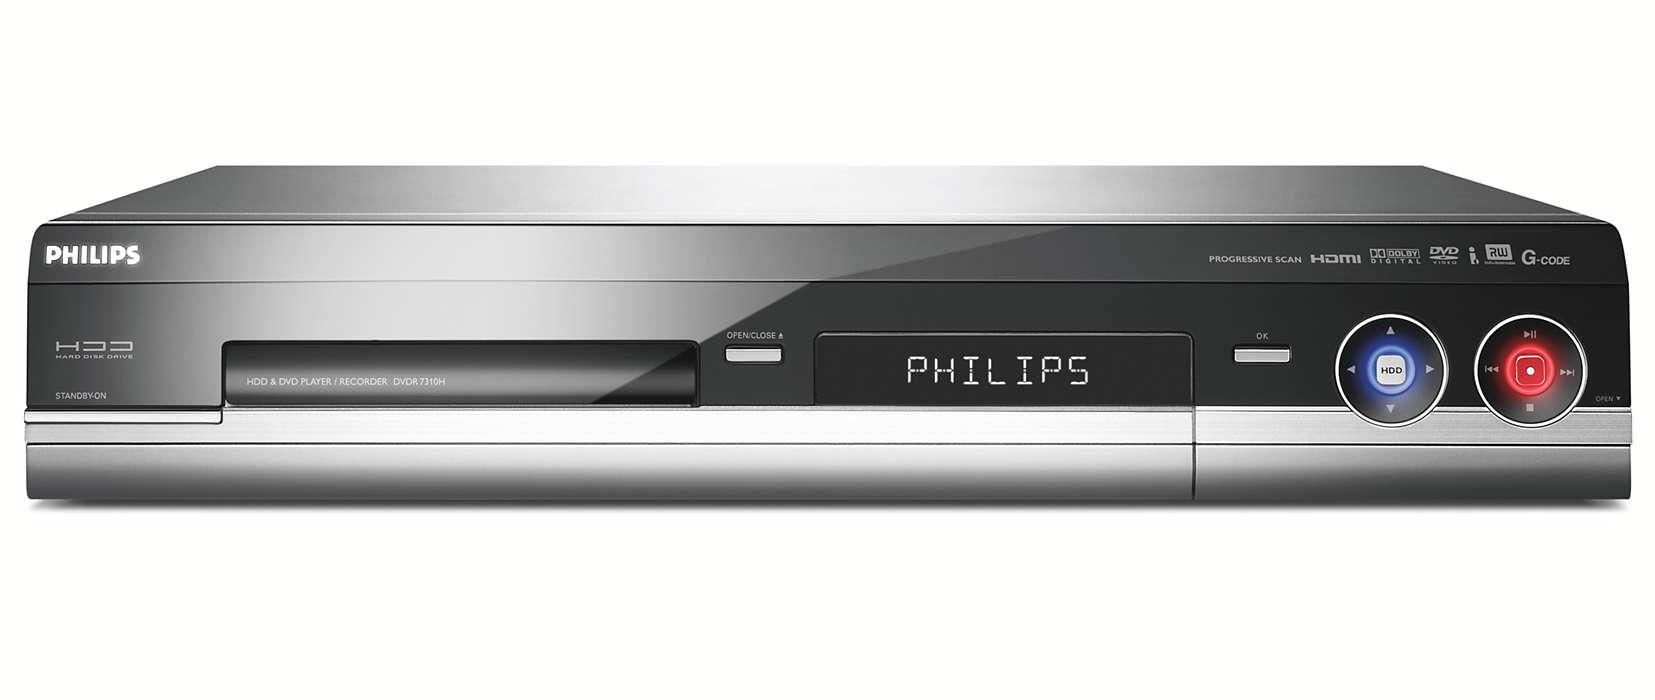 Hard Disk/DVD Recorder